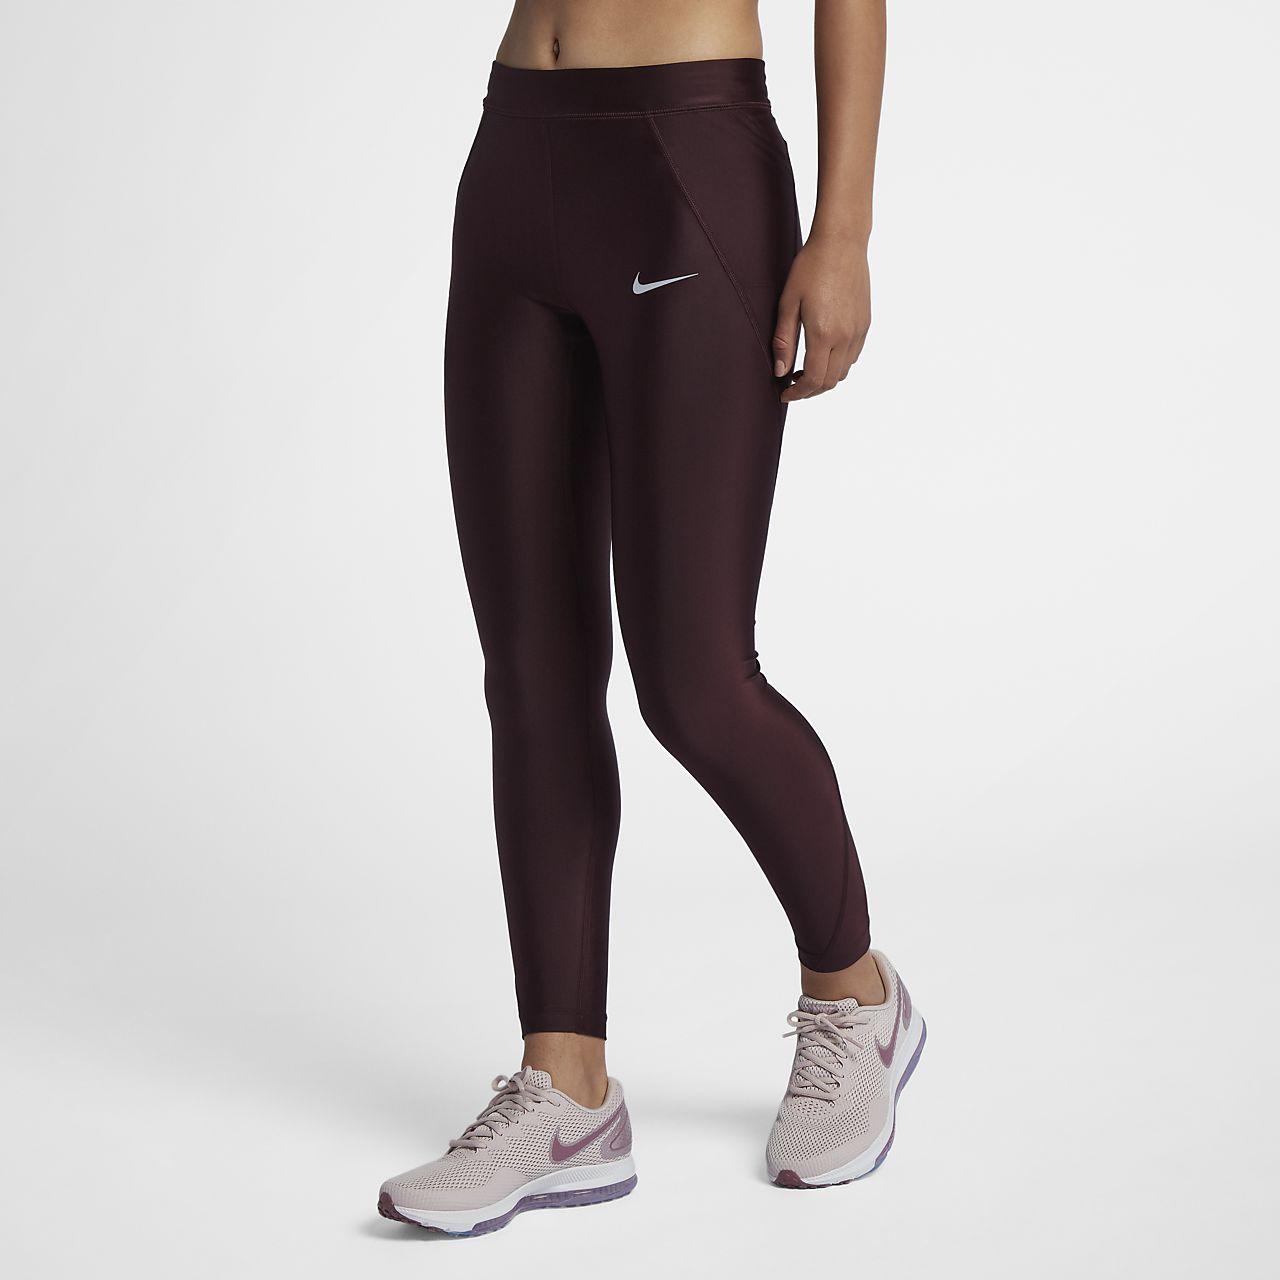 914c6d5f750 Nike Speed Women s 7 8 Tights. Nike.com CH